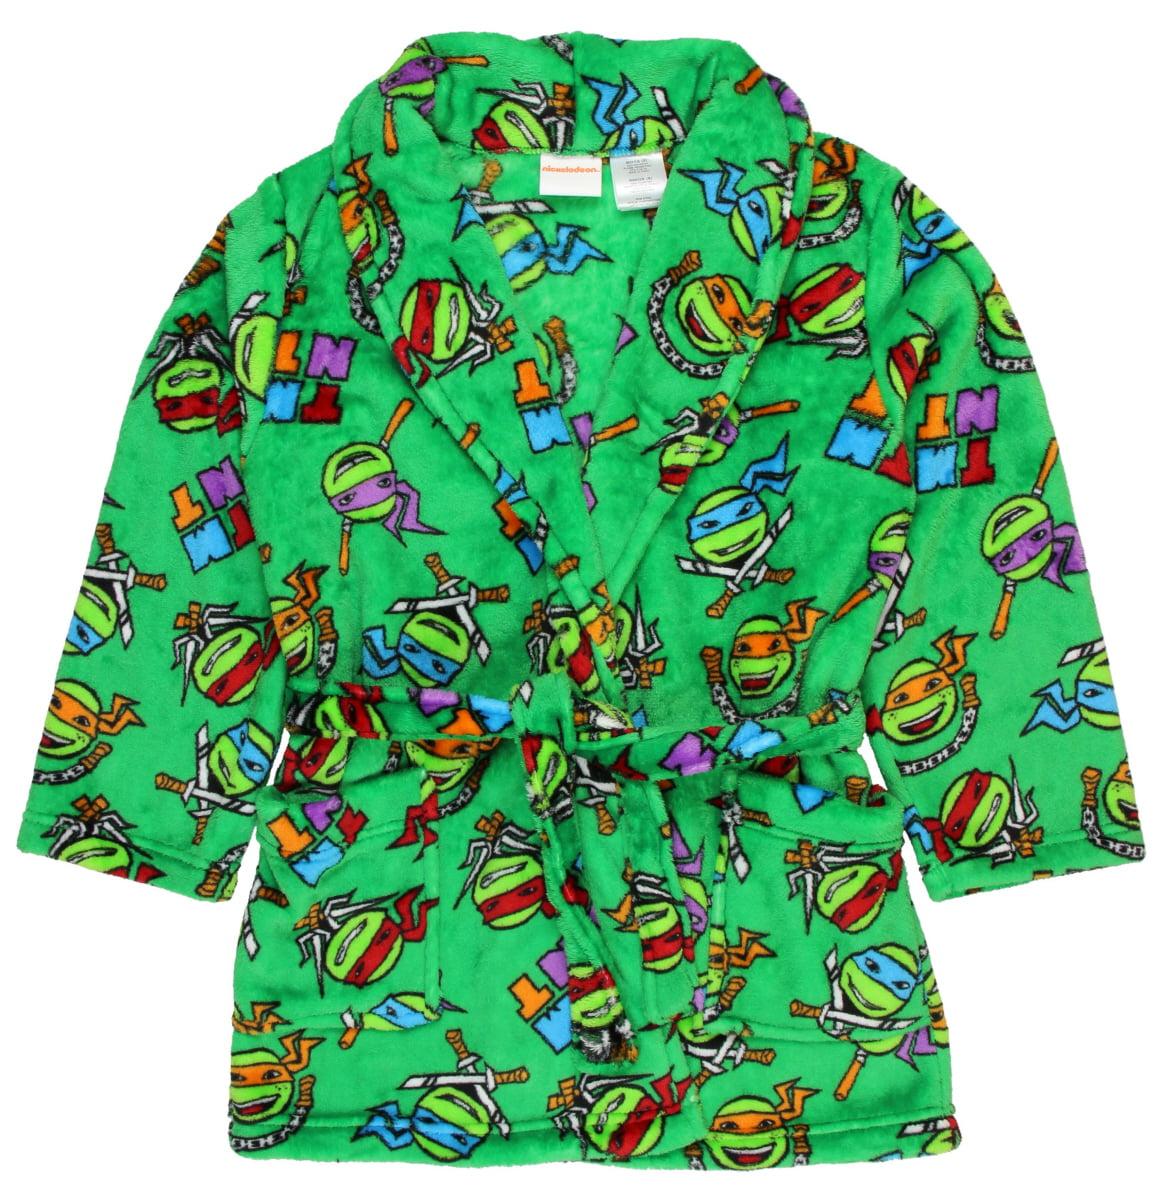 TMNT Teenage Mutant Ninja Turtles Boy's Green Robe